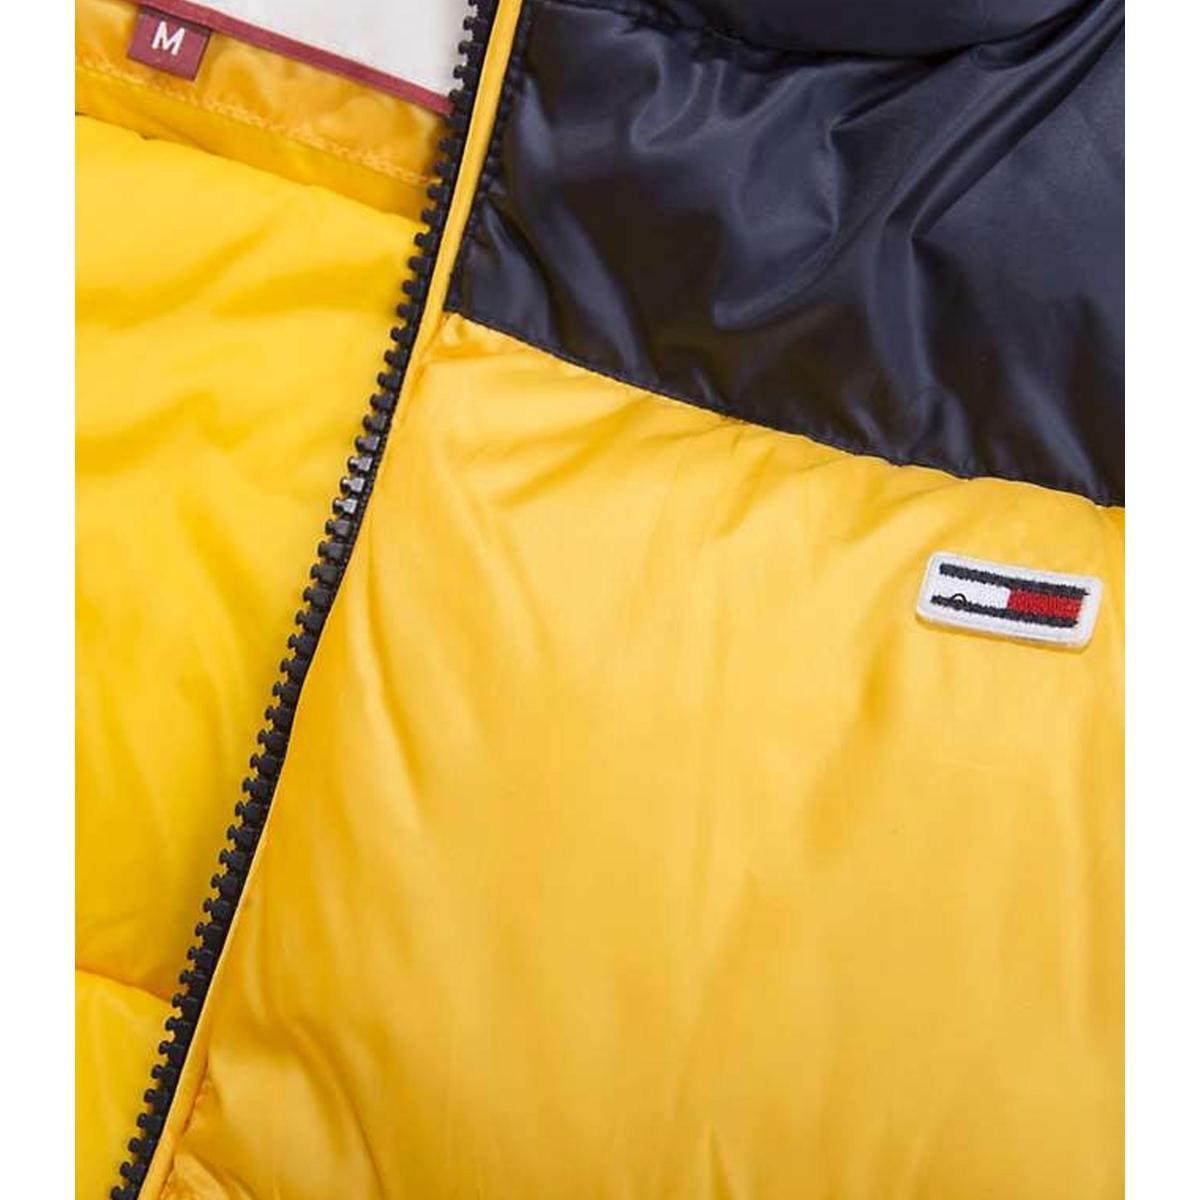 Piumino Giubbotto Tommy Hilfiger Jeans Classics da uomo rif.DM0DM05026